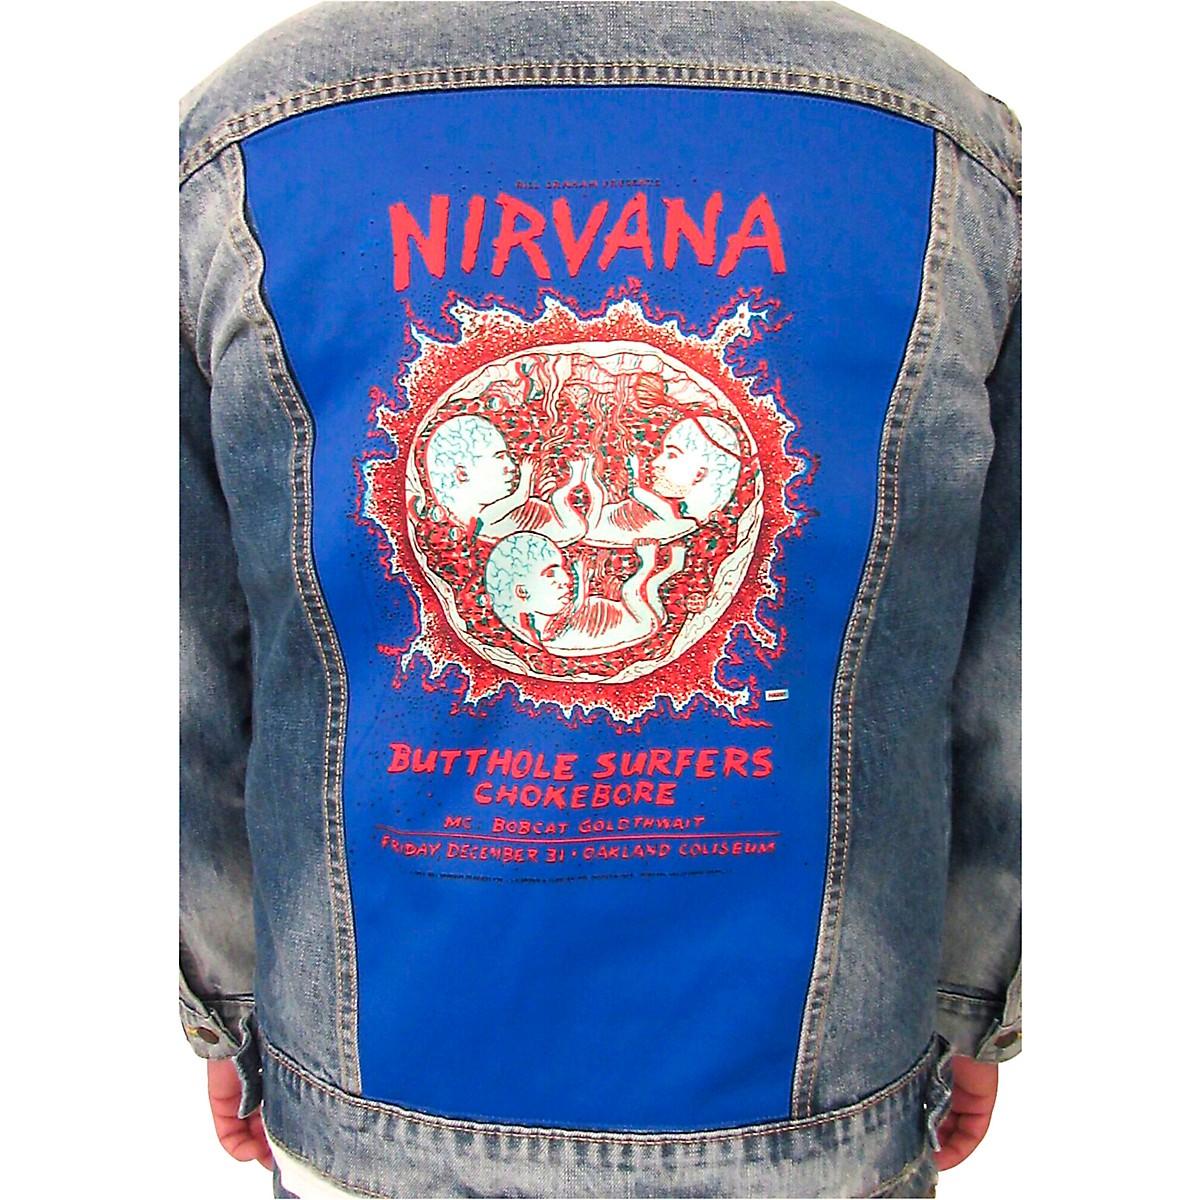 Dragonfly Clothing Nirvana - Oakland Coliseum Embryo - Mens Denim Jacket